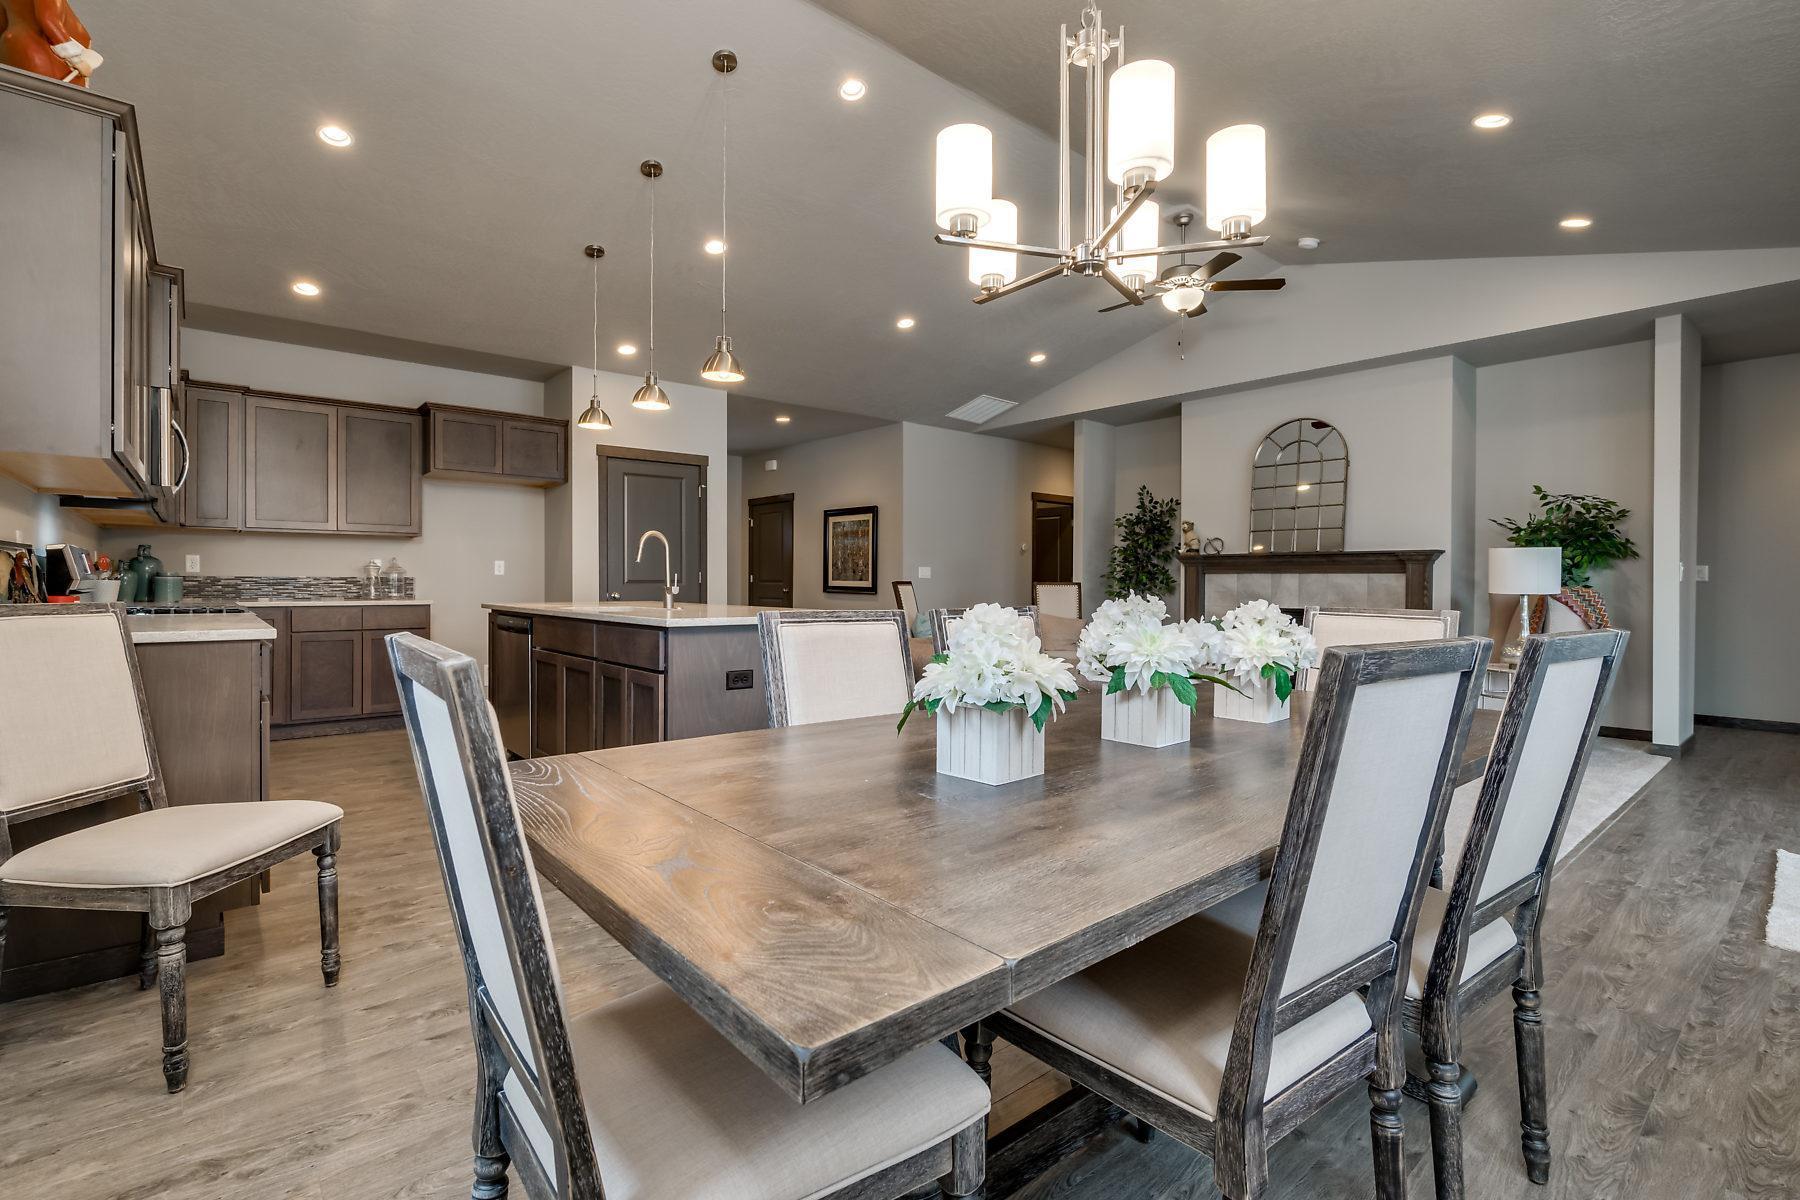 Living Area featured in The St Joe By Architerra Homes in Spokane-Couer d Alene, ID